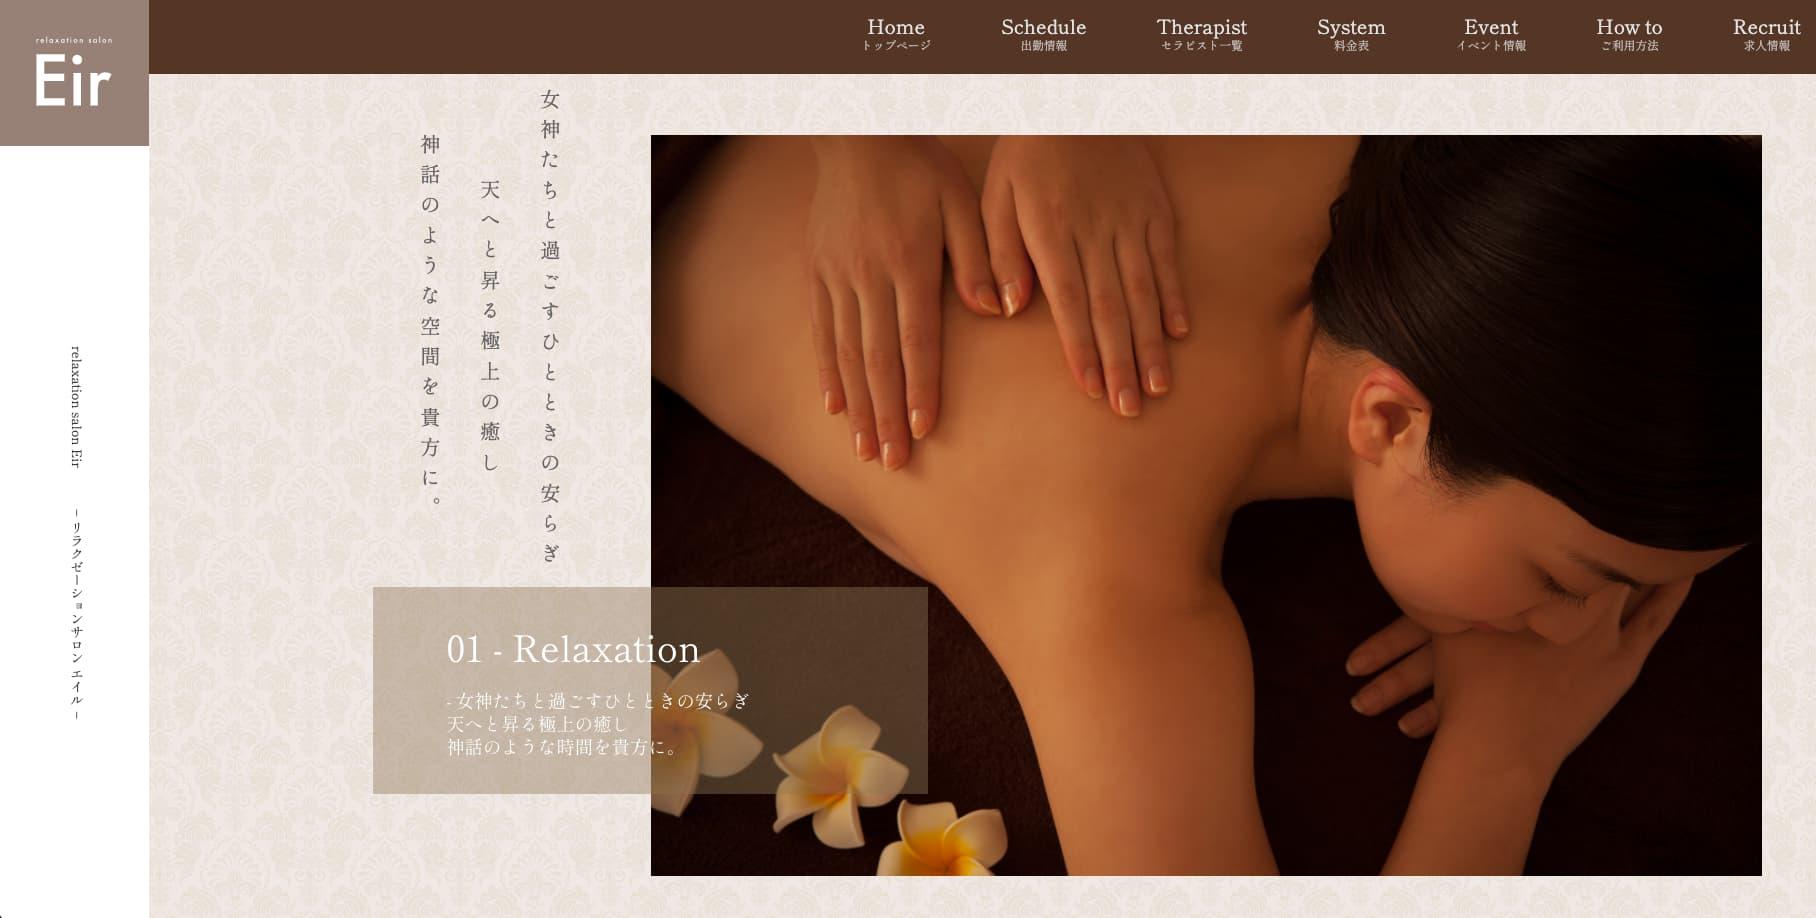 relaxation salon Eir(エイル)